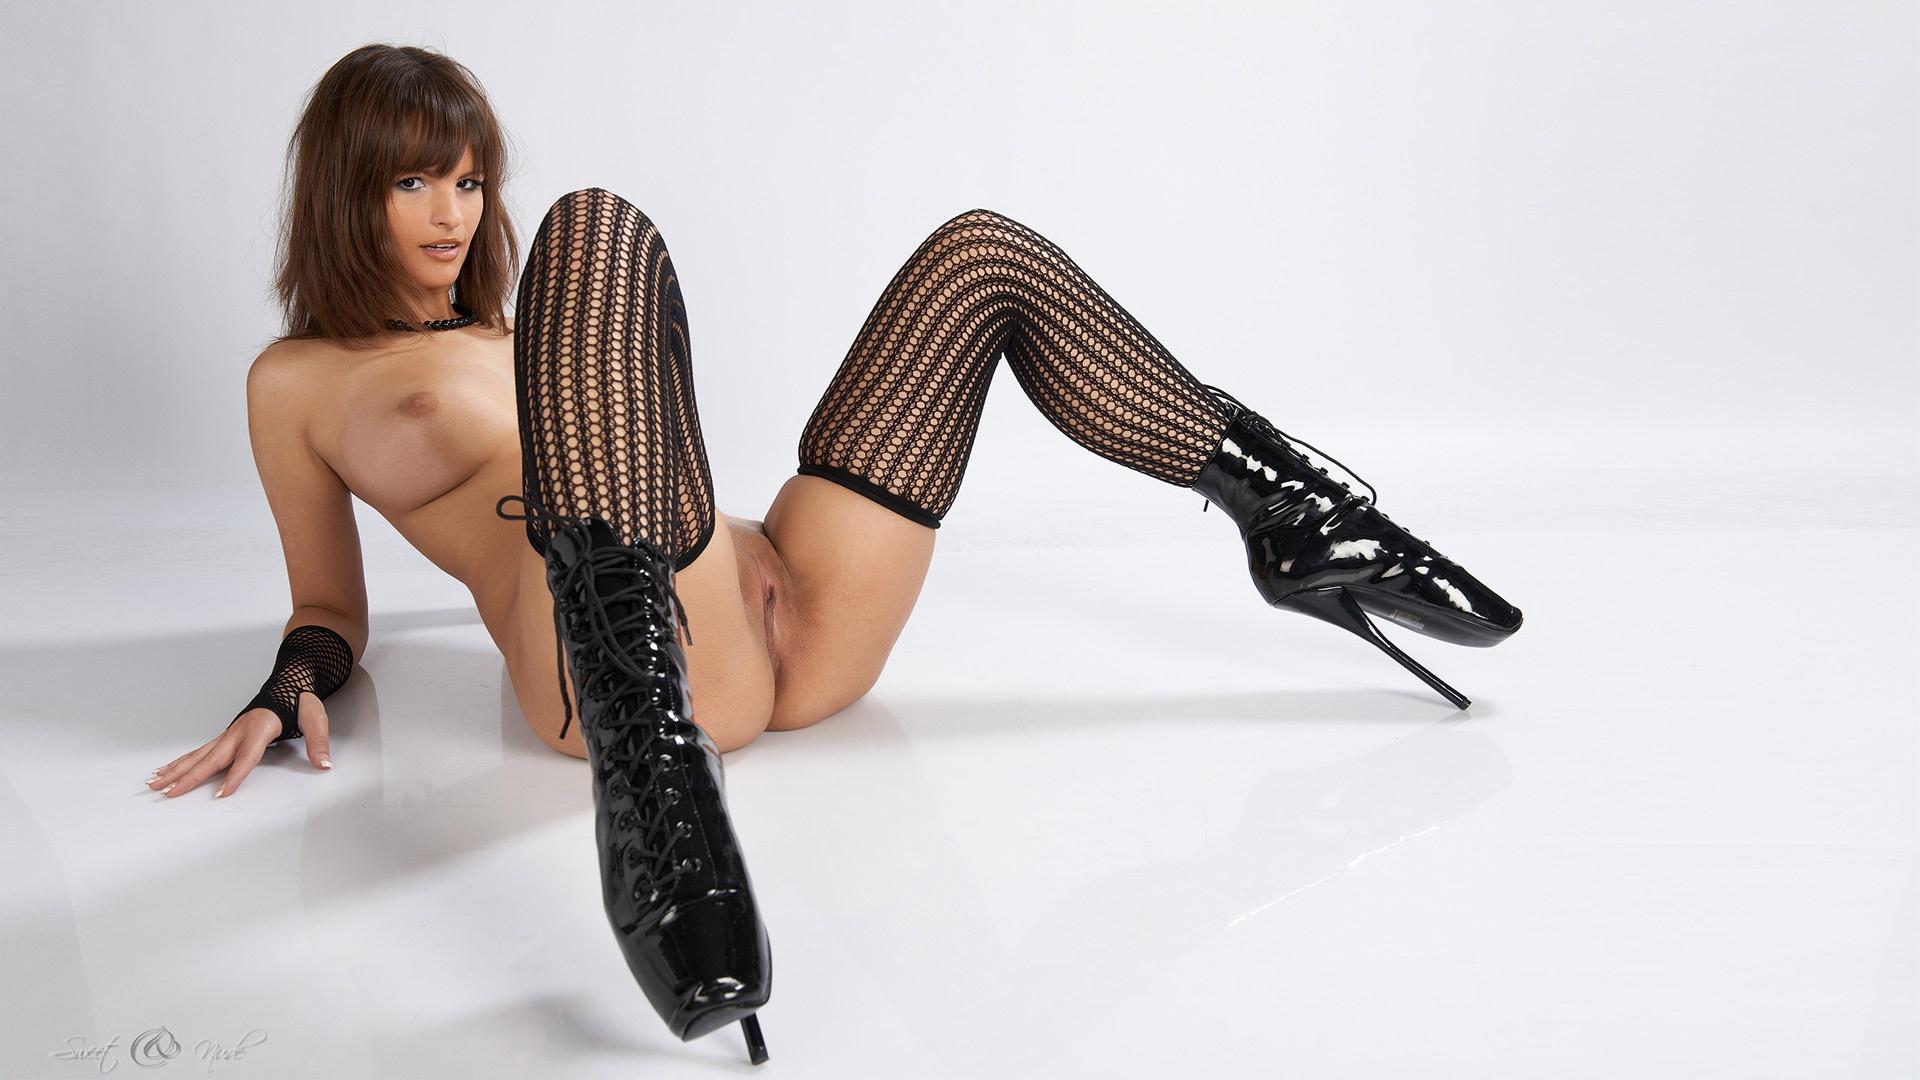 Women sexy heels nude wearing high